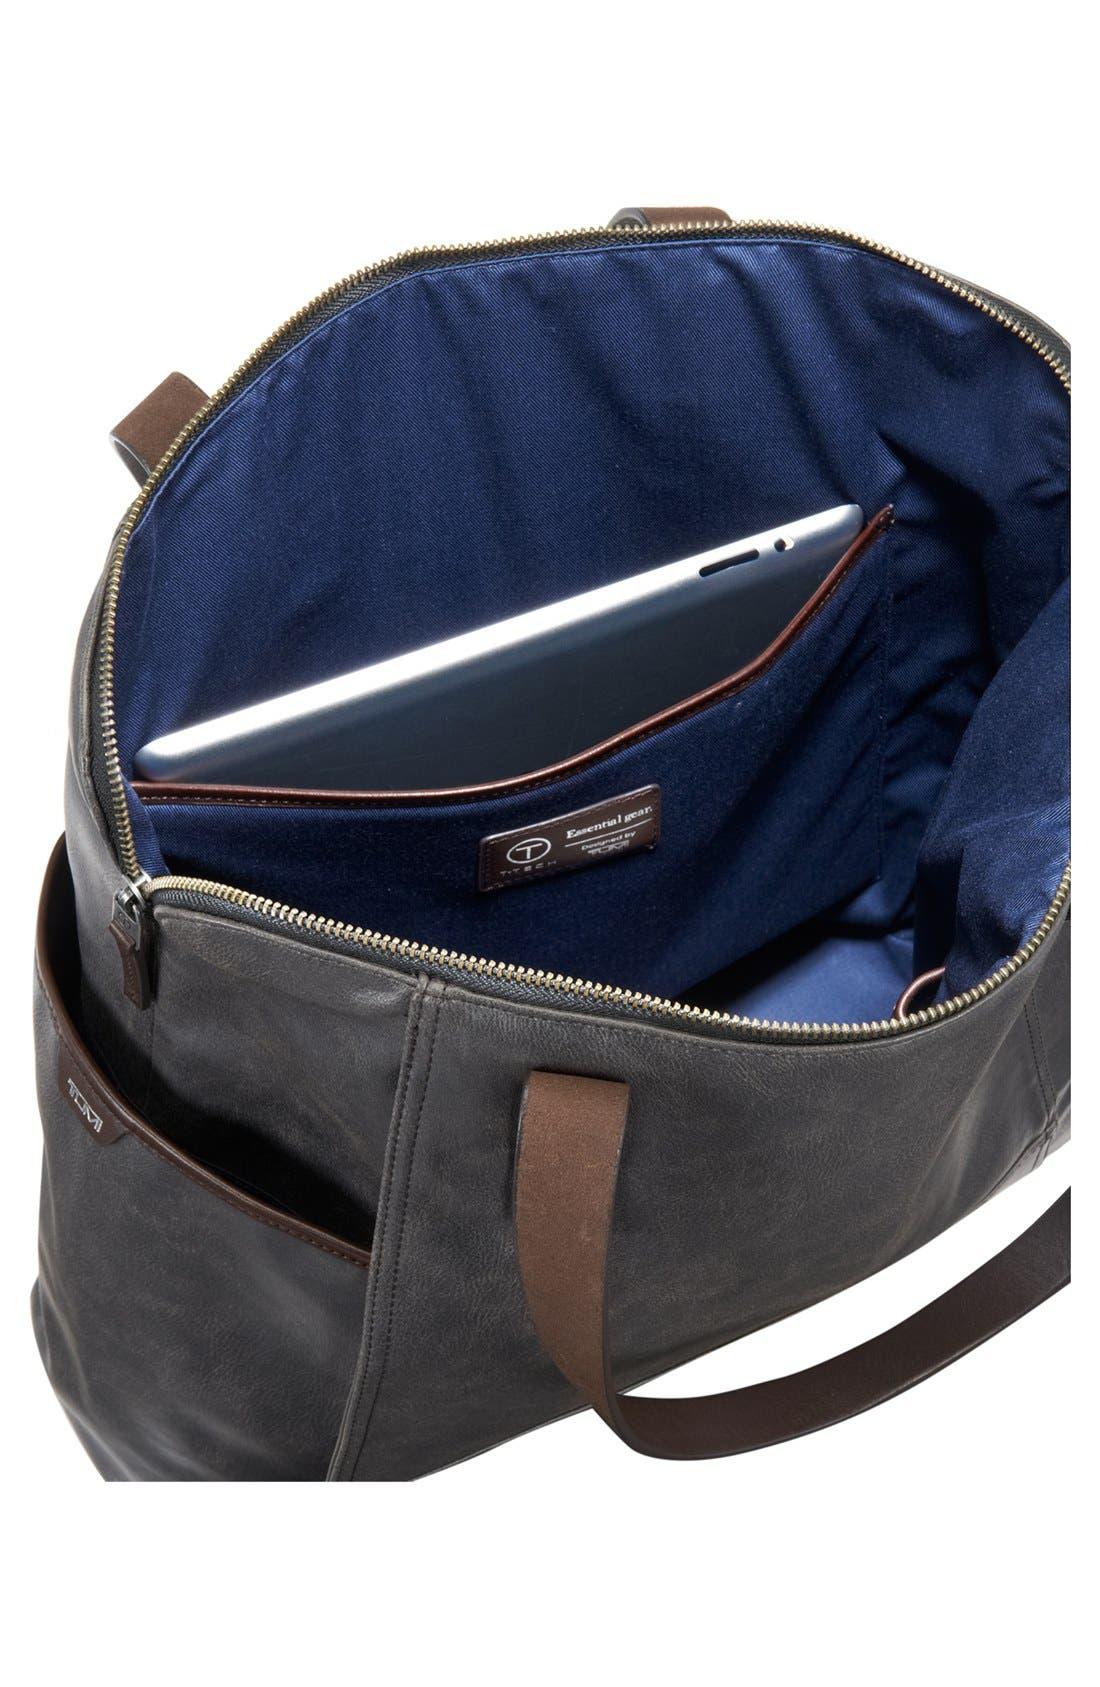 Alternate Image 4  - T-Tech by Tumi 'Forge - Sudbury' Tote Bag